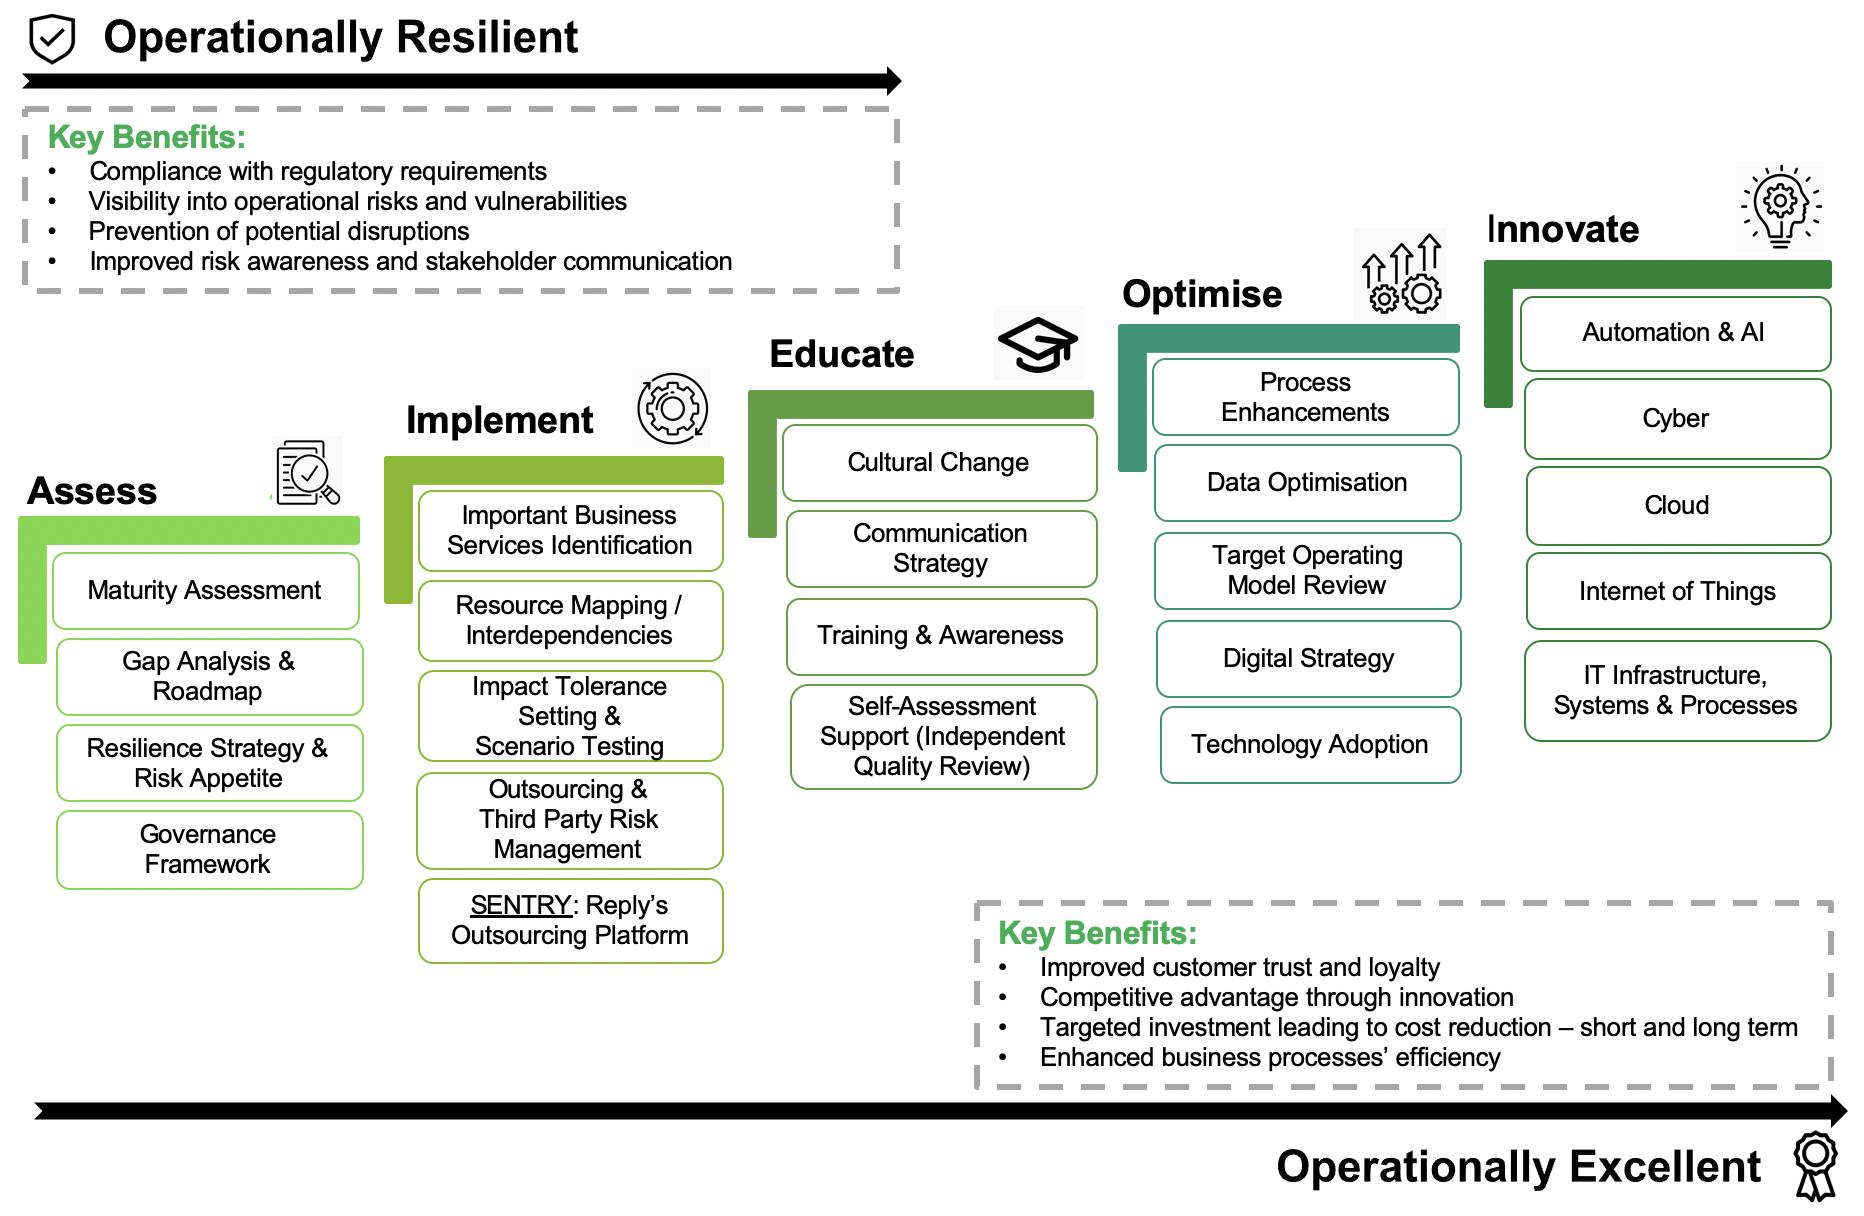 Operational-Excellence-framework.png